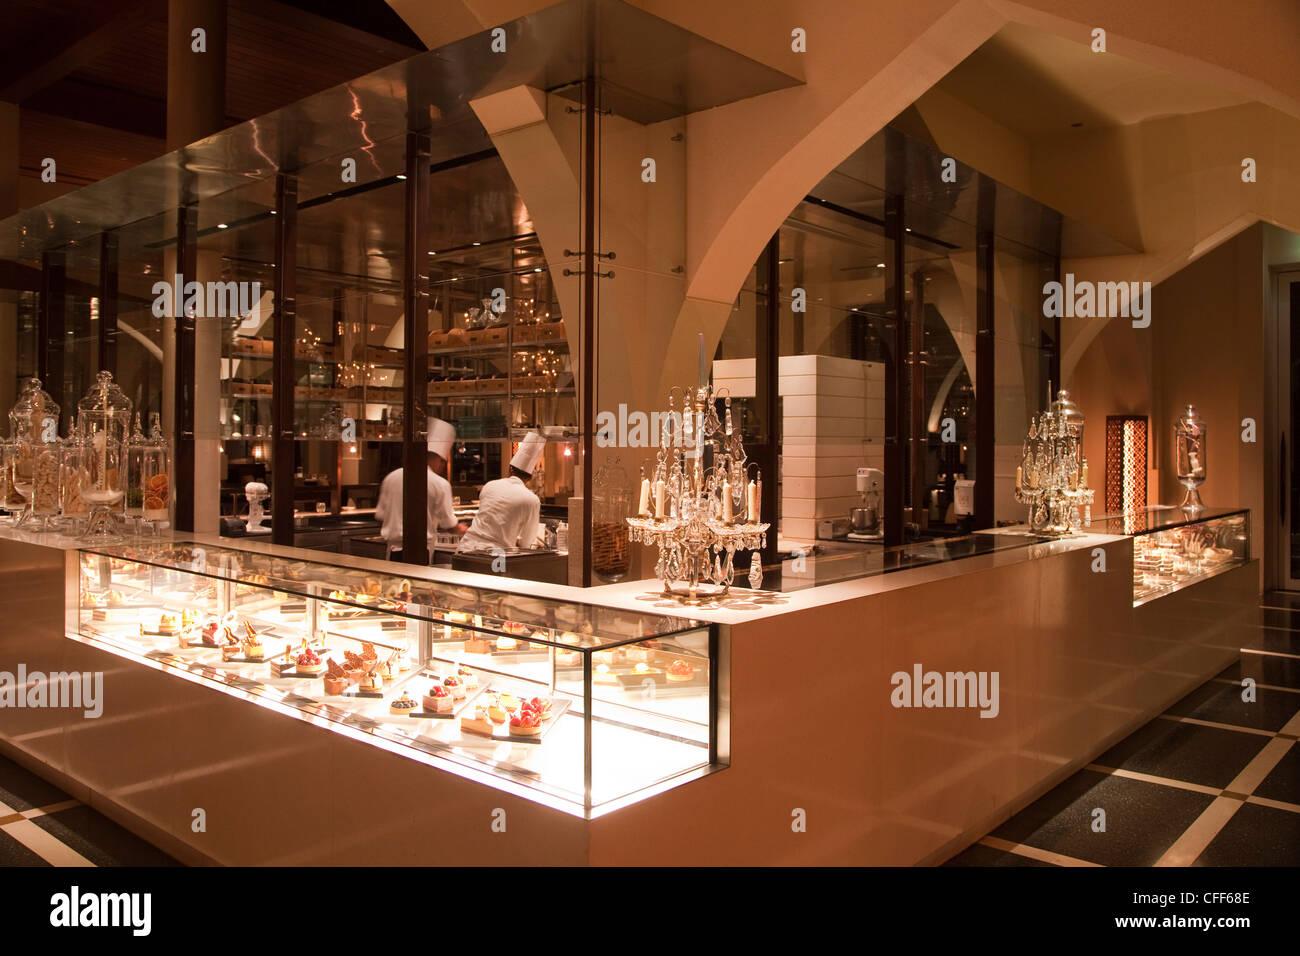 Patisserie inside The Restaurant, The Chedi Muscat hotel, Muscat, Masqat, Oman, Arabian Peninsula - Stock Image